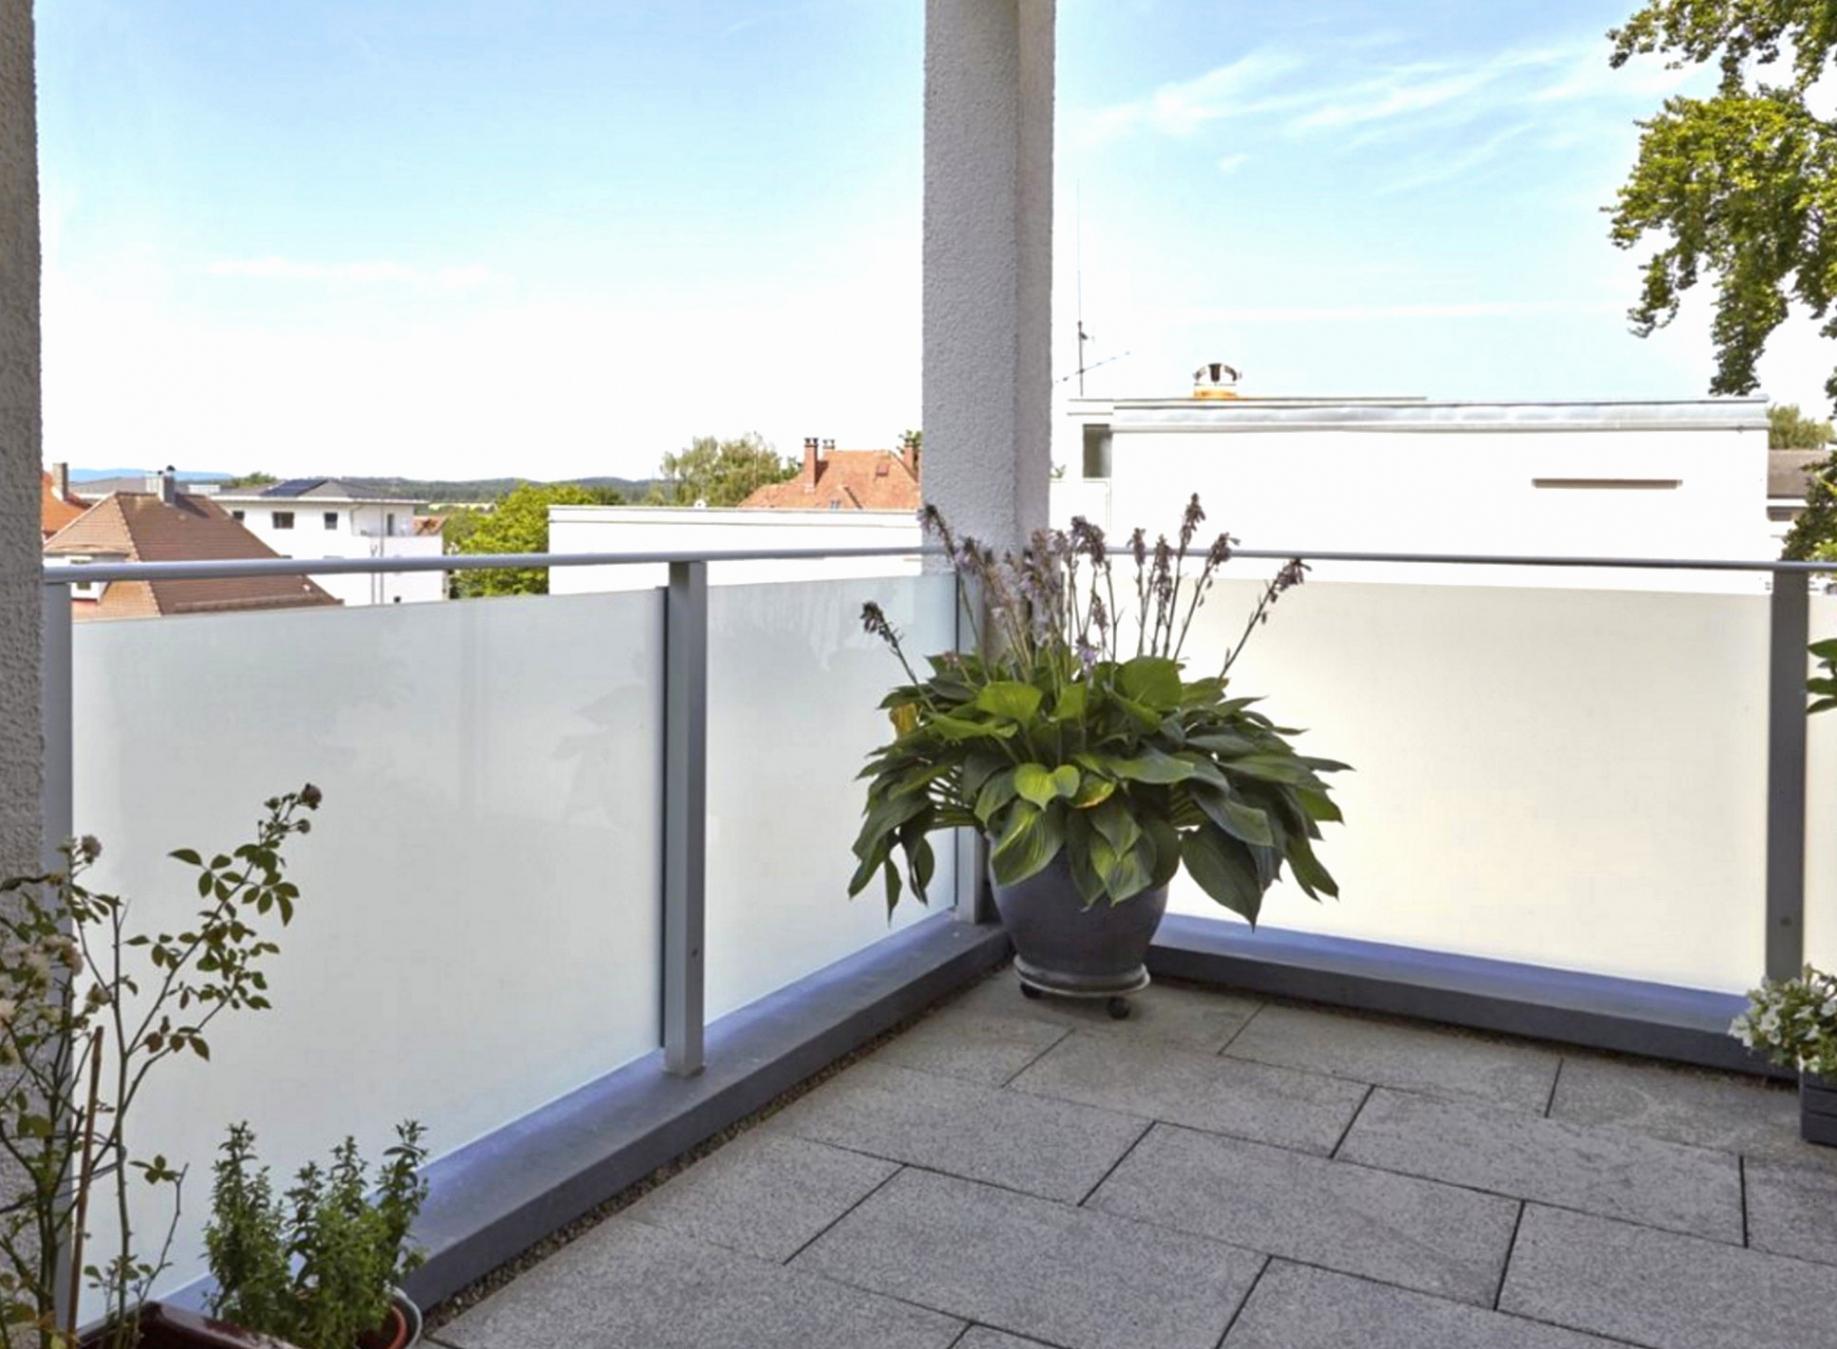 Gartenfiguren Selber Machen Luxus Gartendeko Selber Machen — Temobardz Home Blog